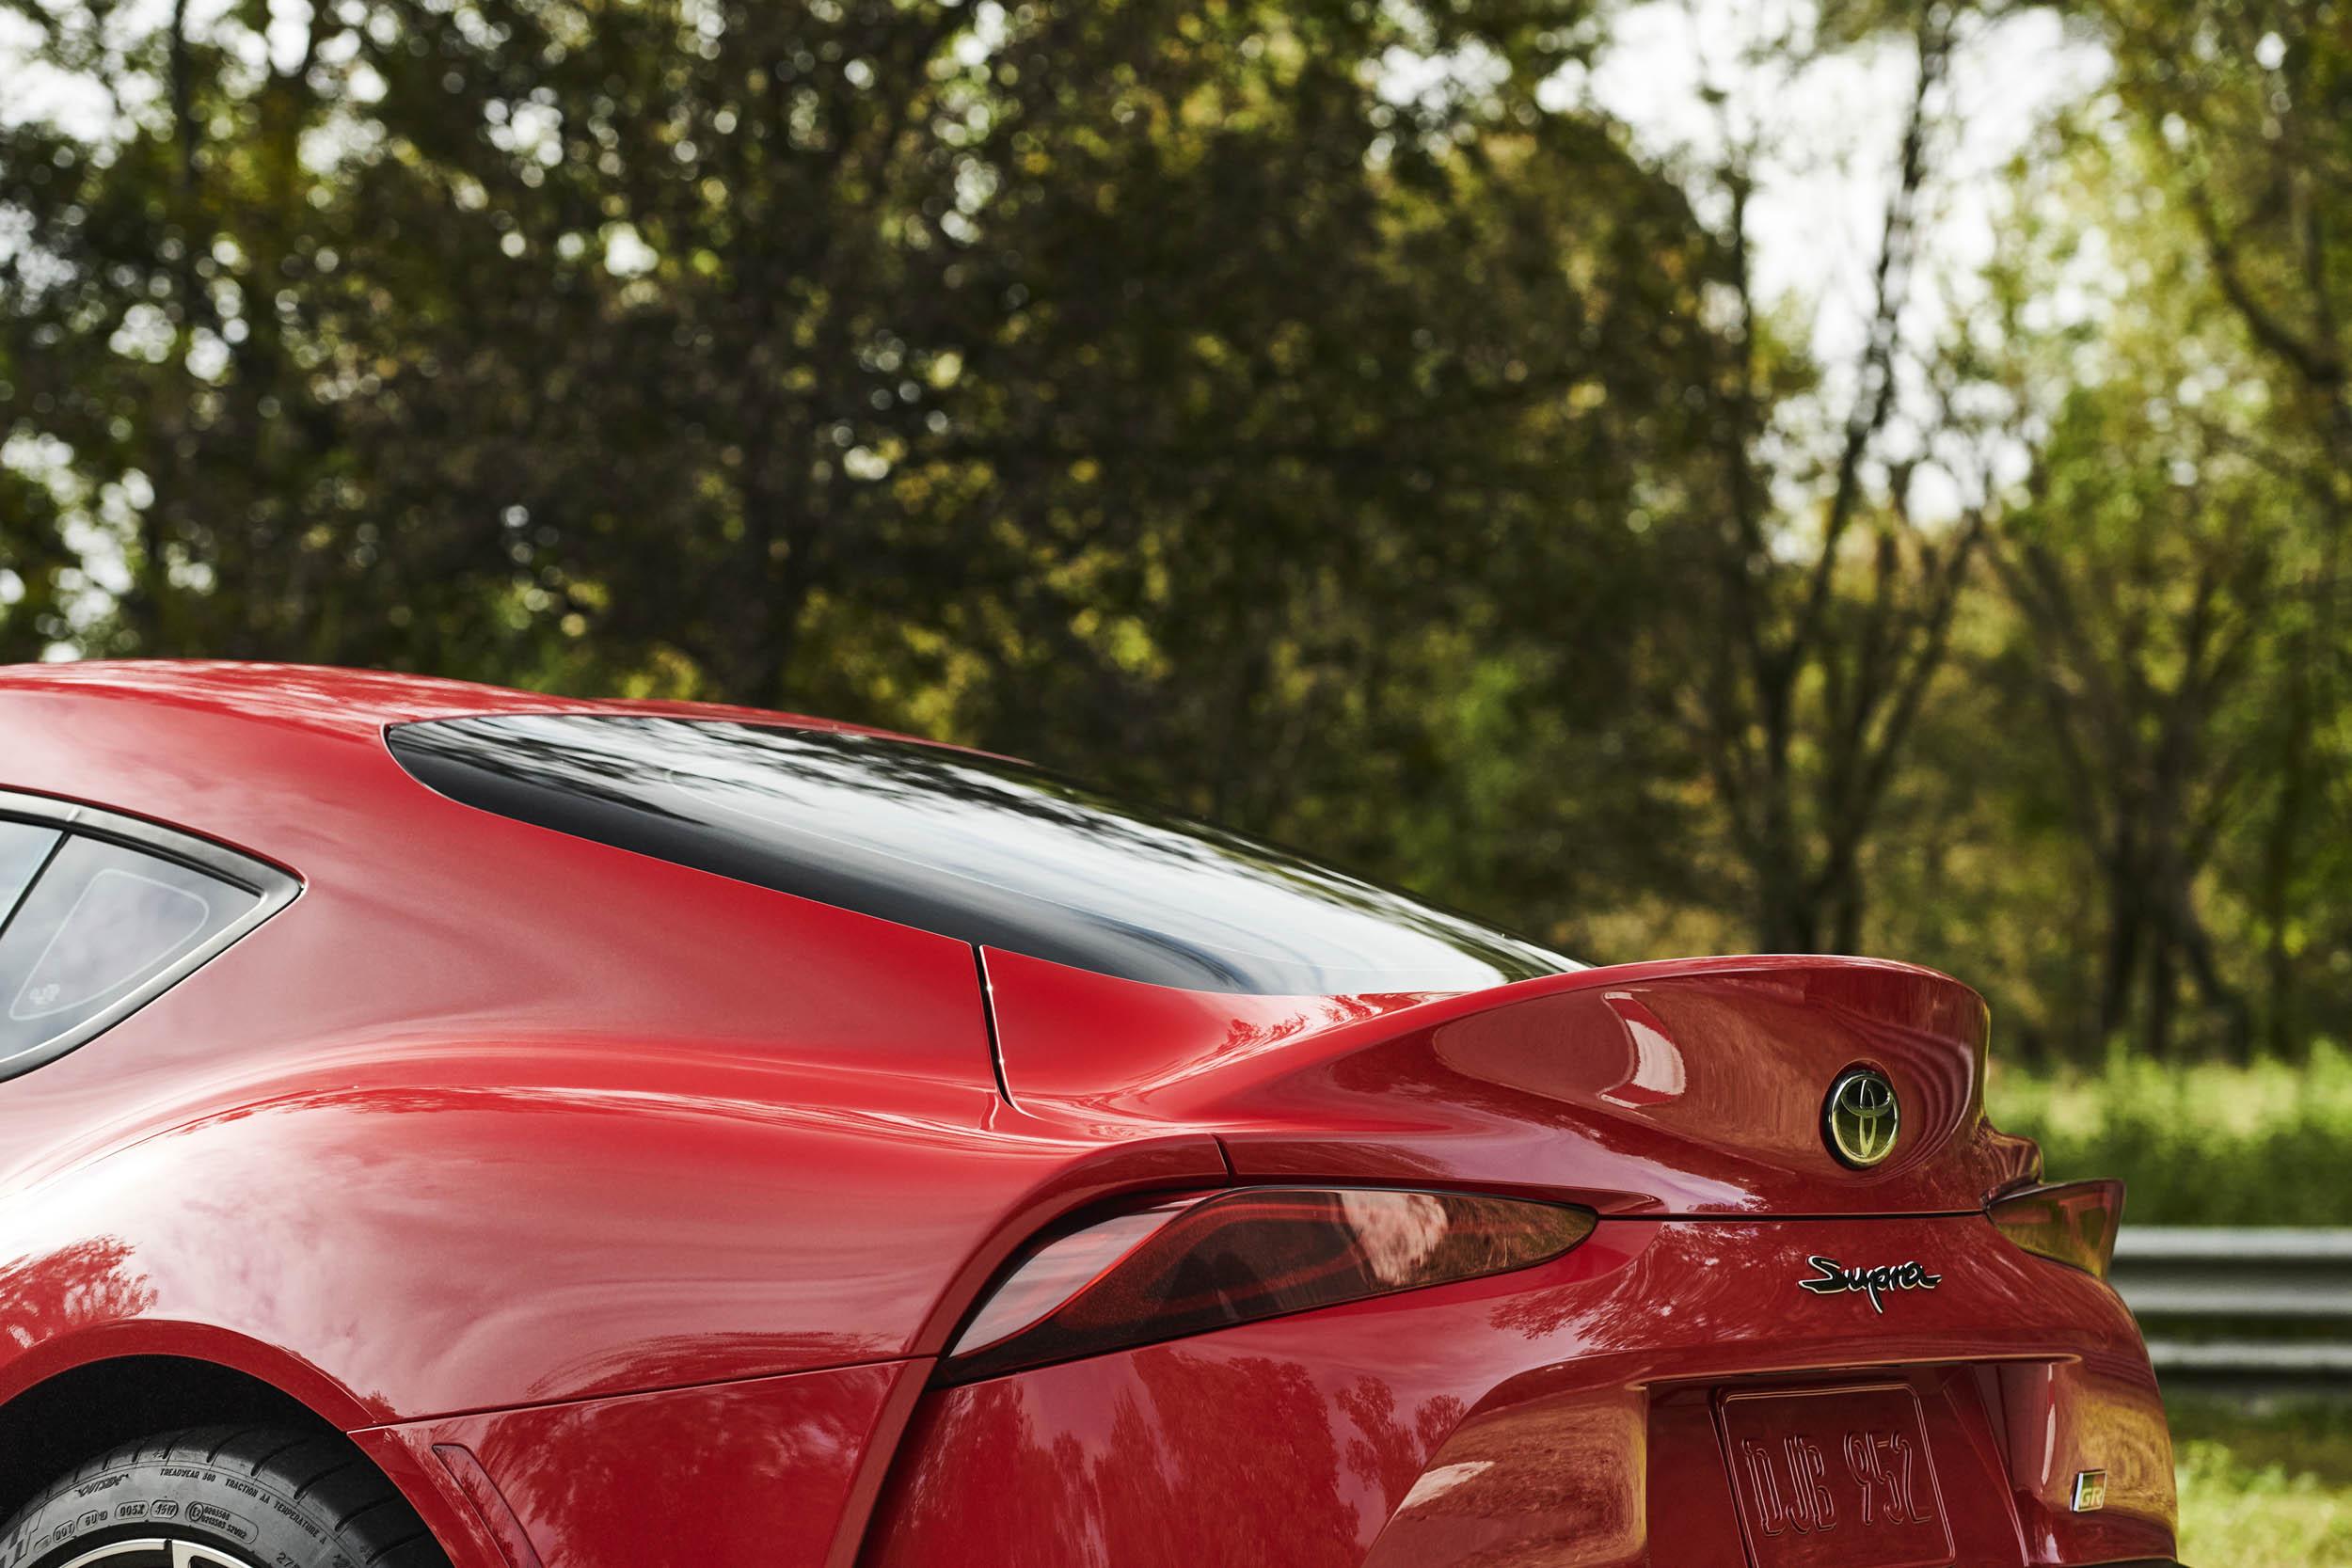 2020 Toyota Supra rear spoiler